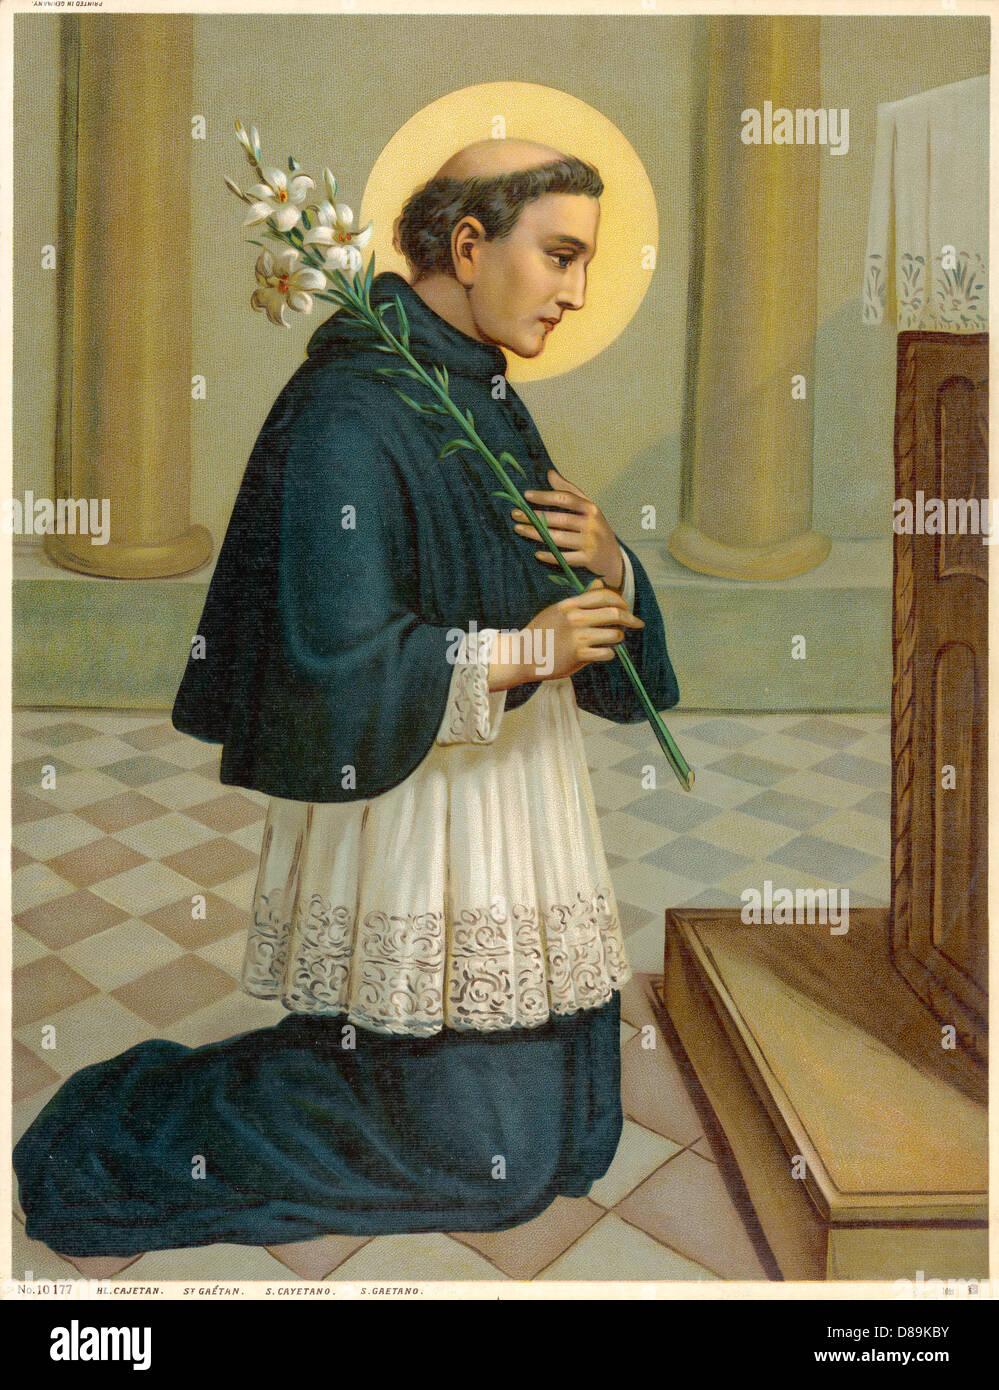 Saint Gaetano - Stock Image